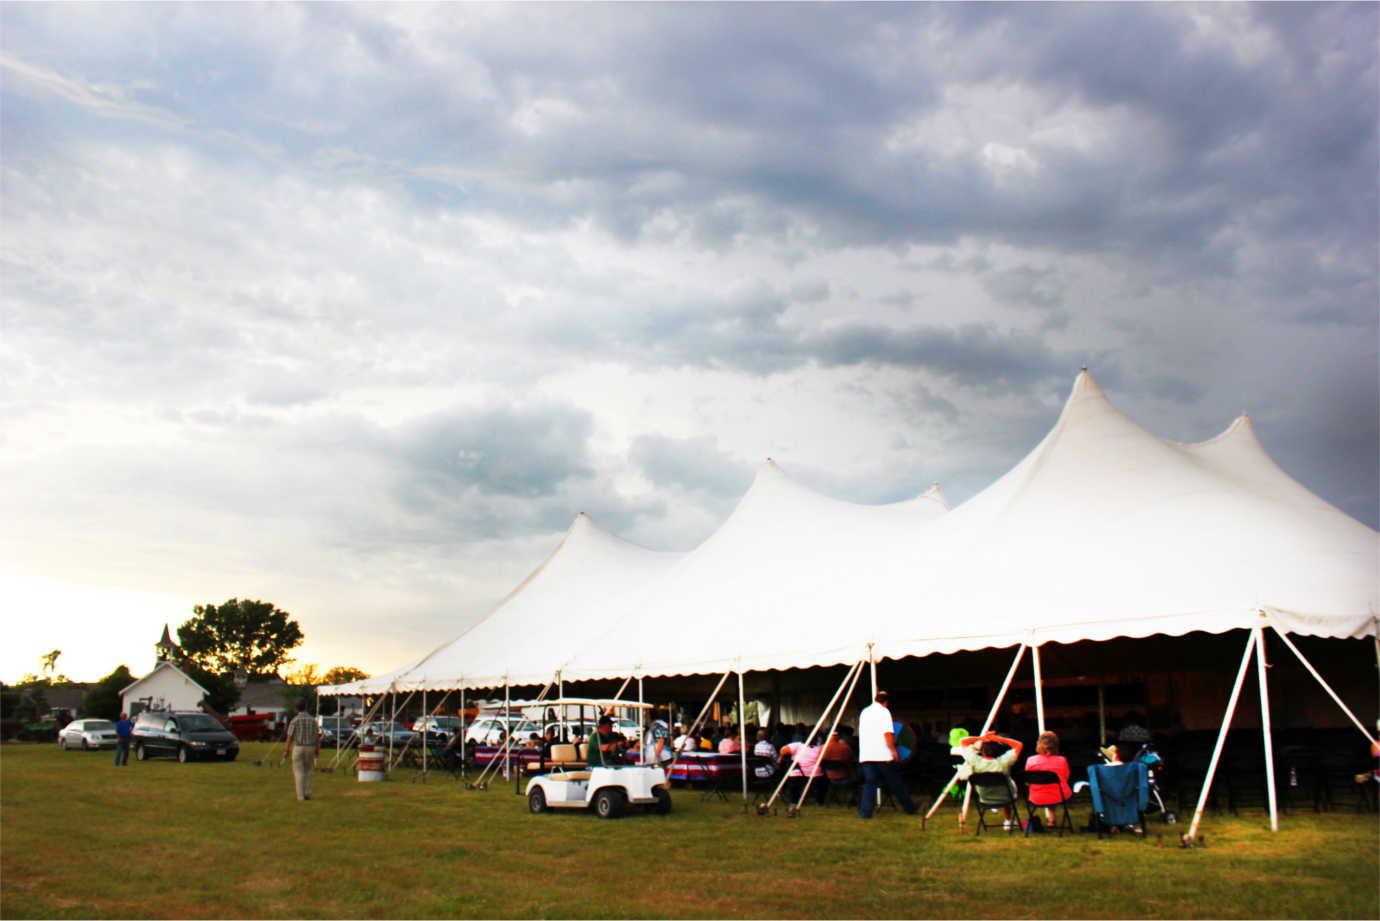 Nebraska Chautauqua brings high-quality humanities programming to rural areas. Image courtesy of Humanities Nebraska.